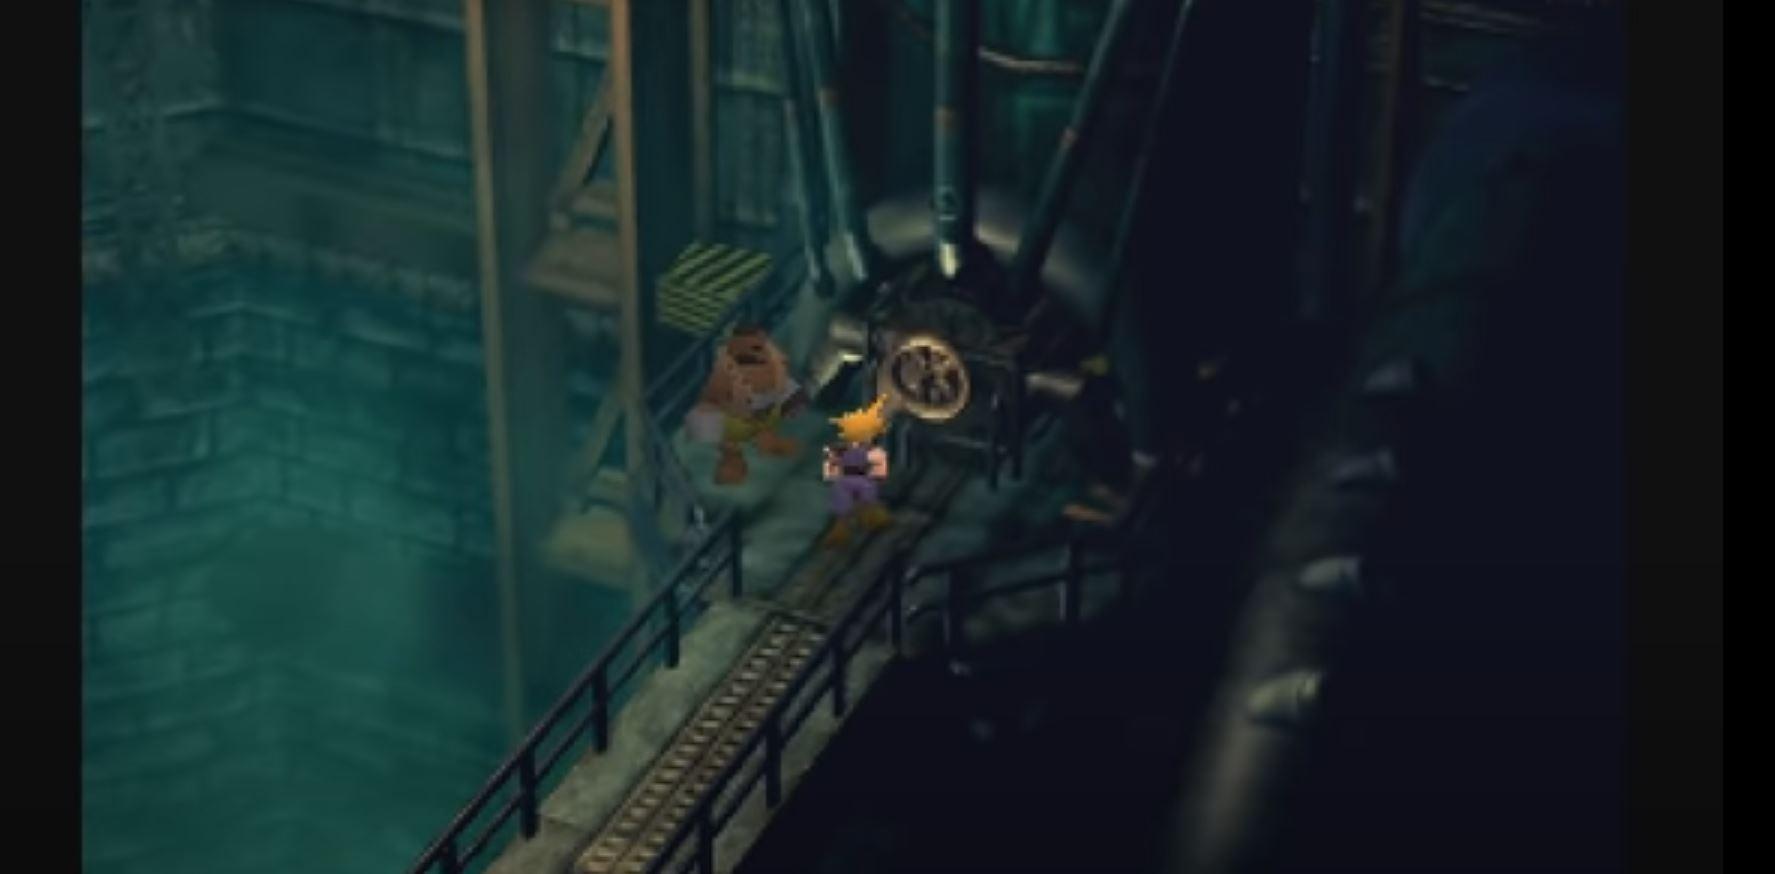 Final Fantasy 7: Cloud und Barret infiltrieren den Mako-Reaktor